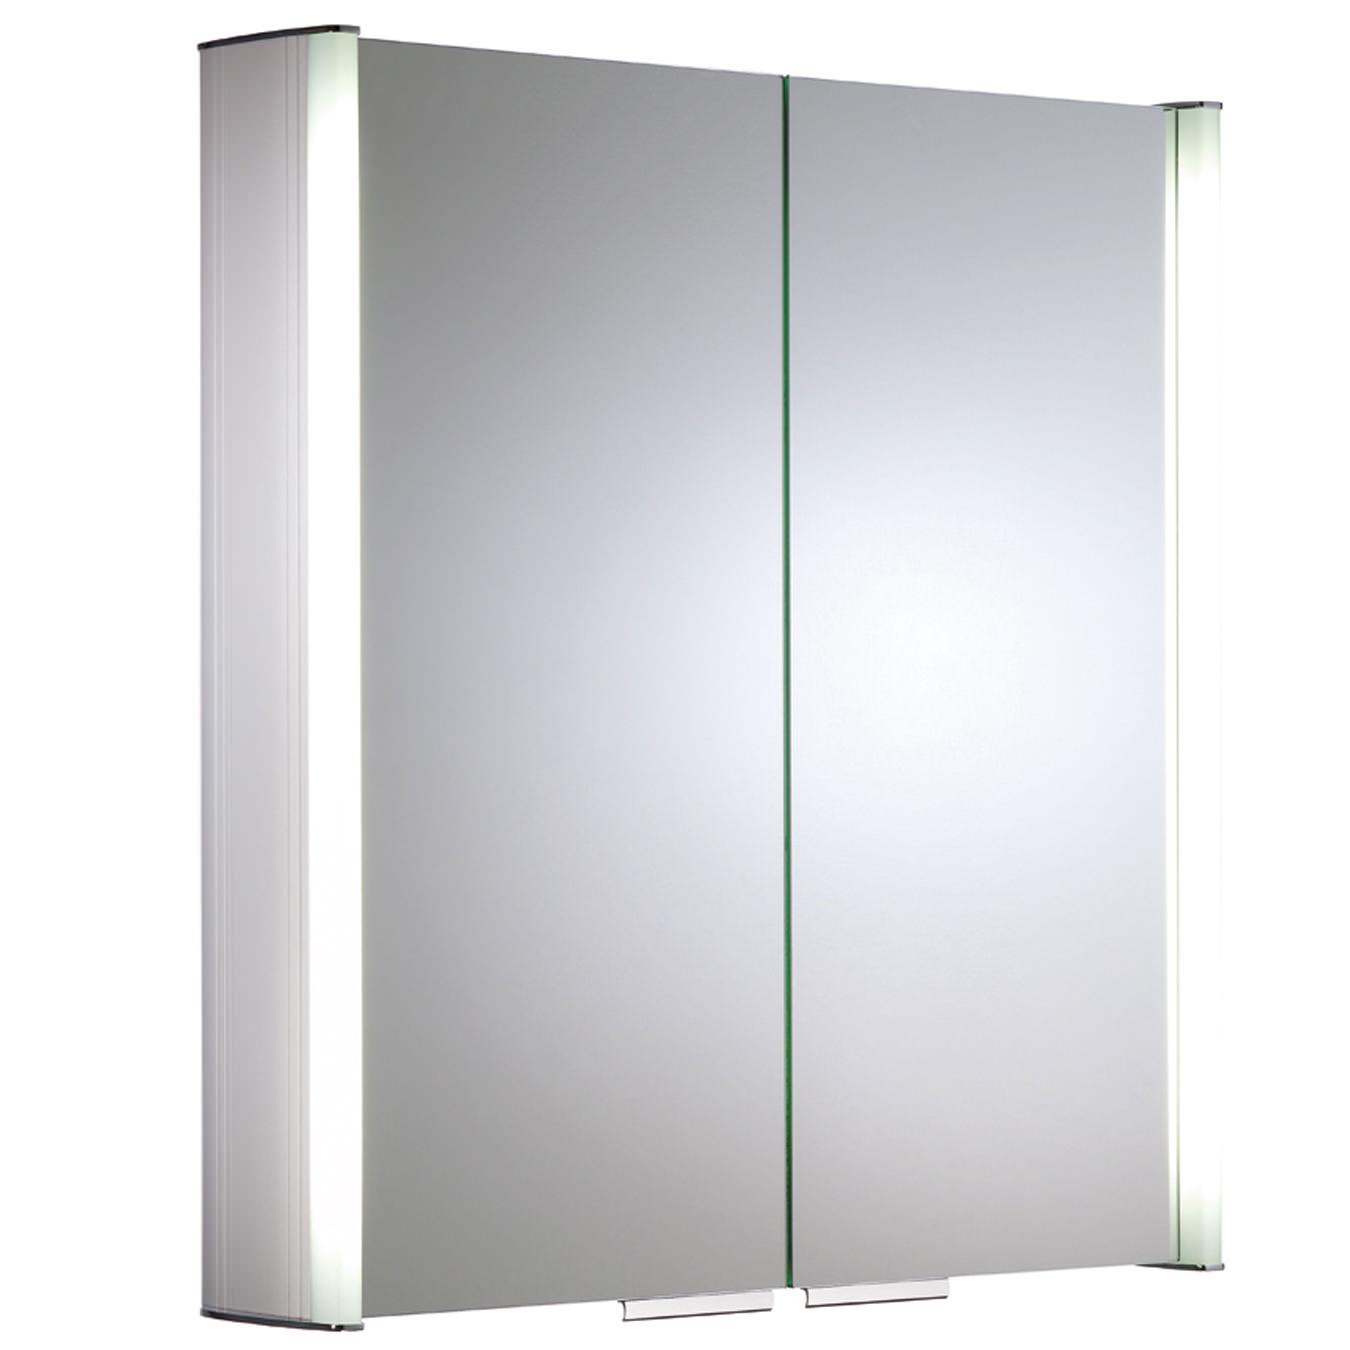 Roper Rhodes Ascension Summit Double Mirror Glass Door Cabinet